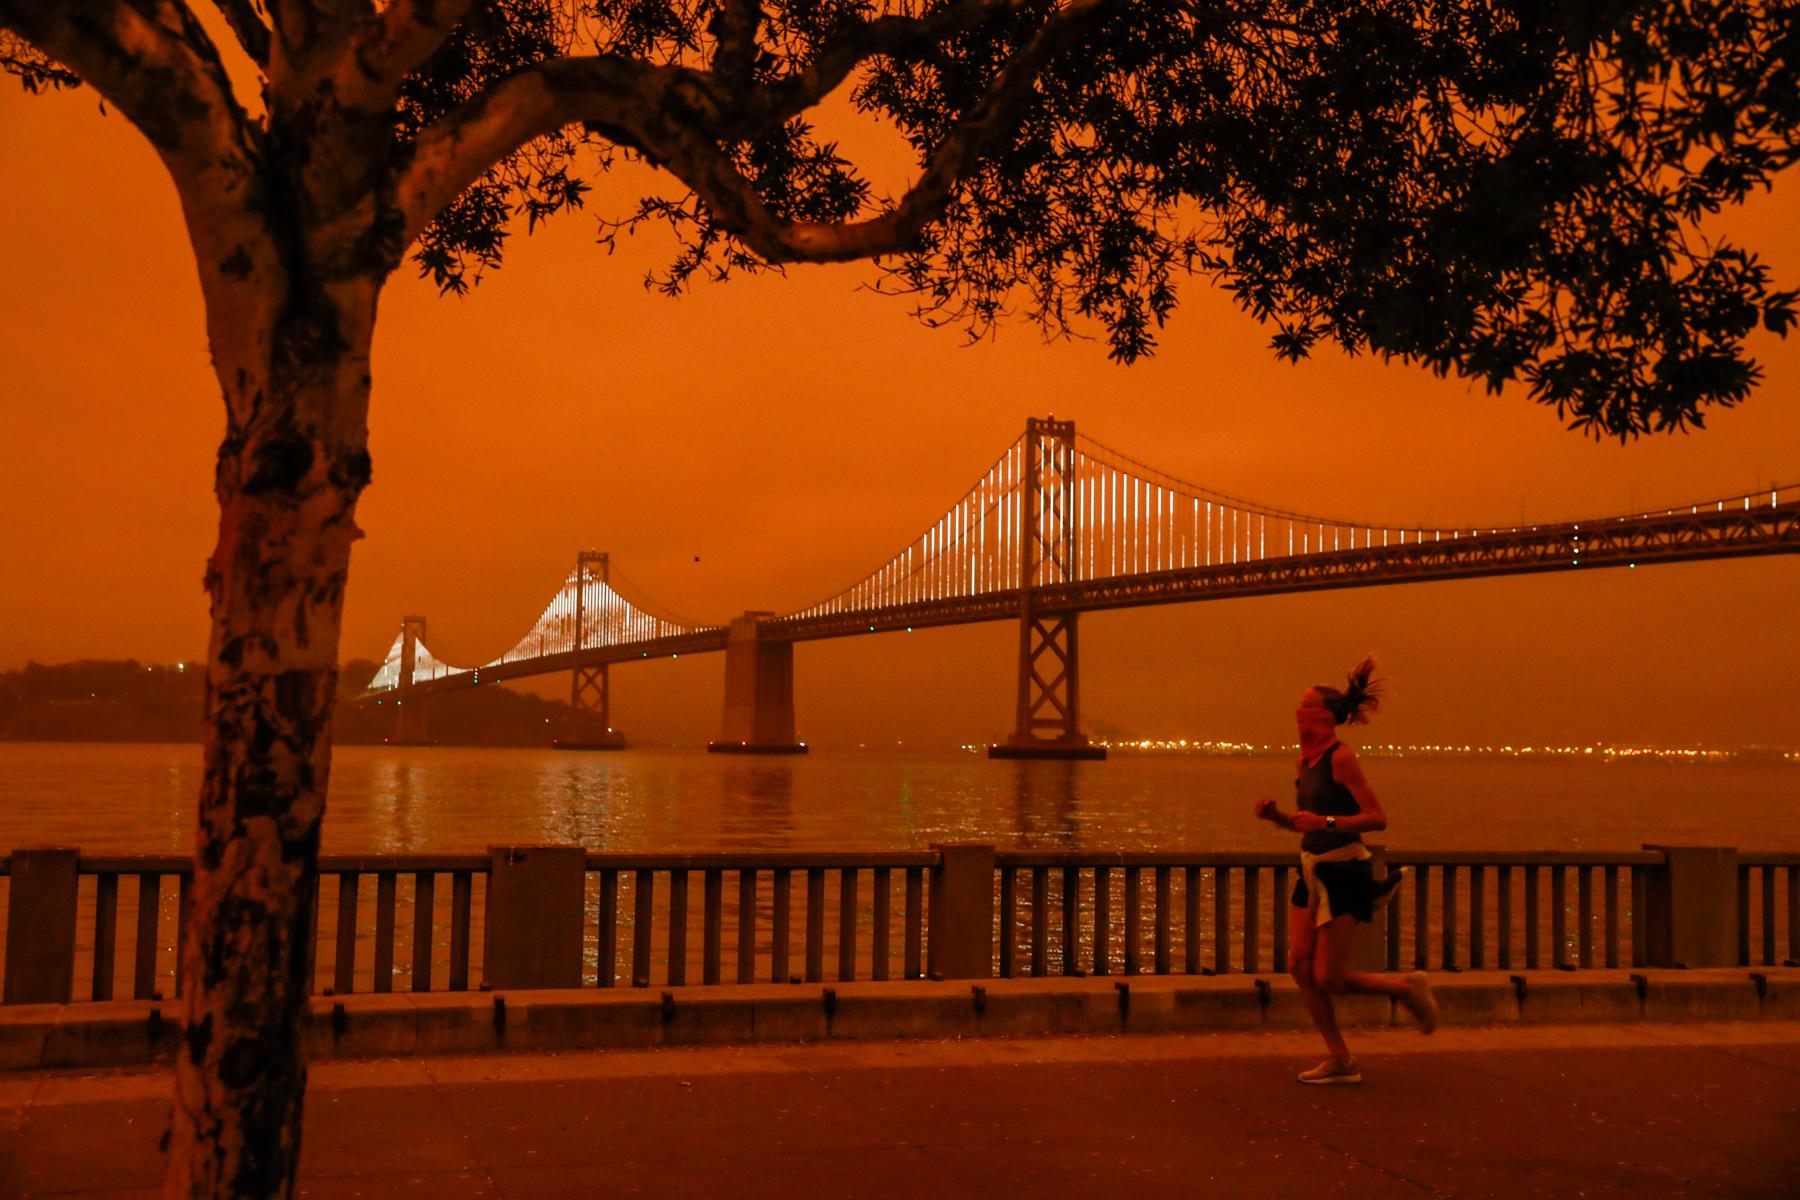 The Bay Bridge across San Francisco Bay at twilight, with the sky orange with smoke.